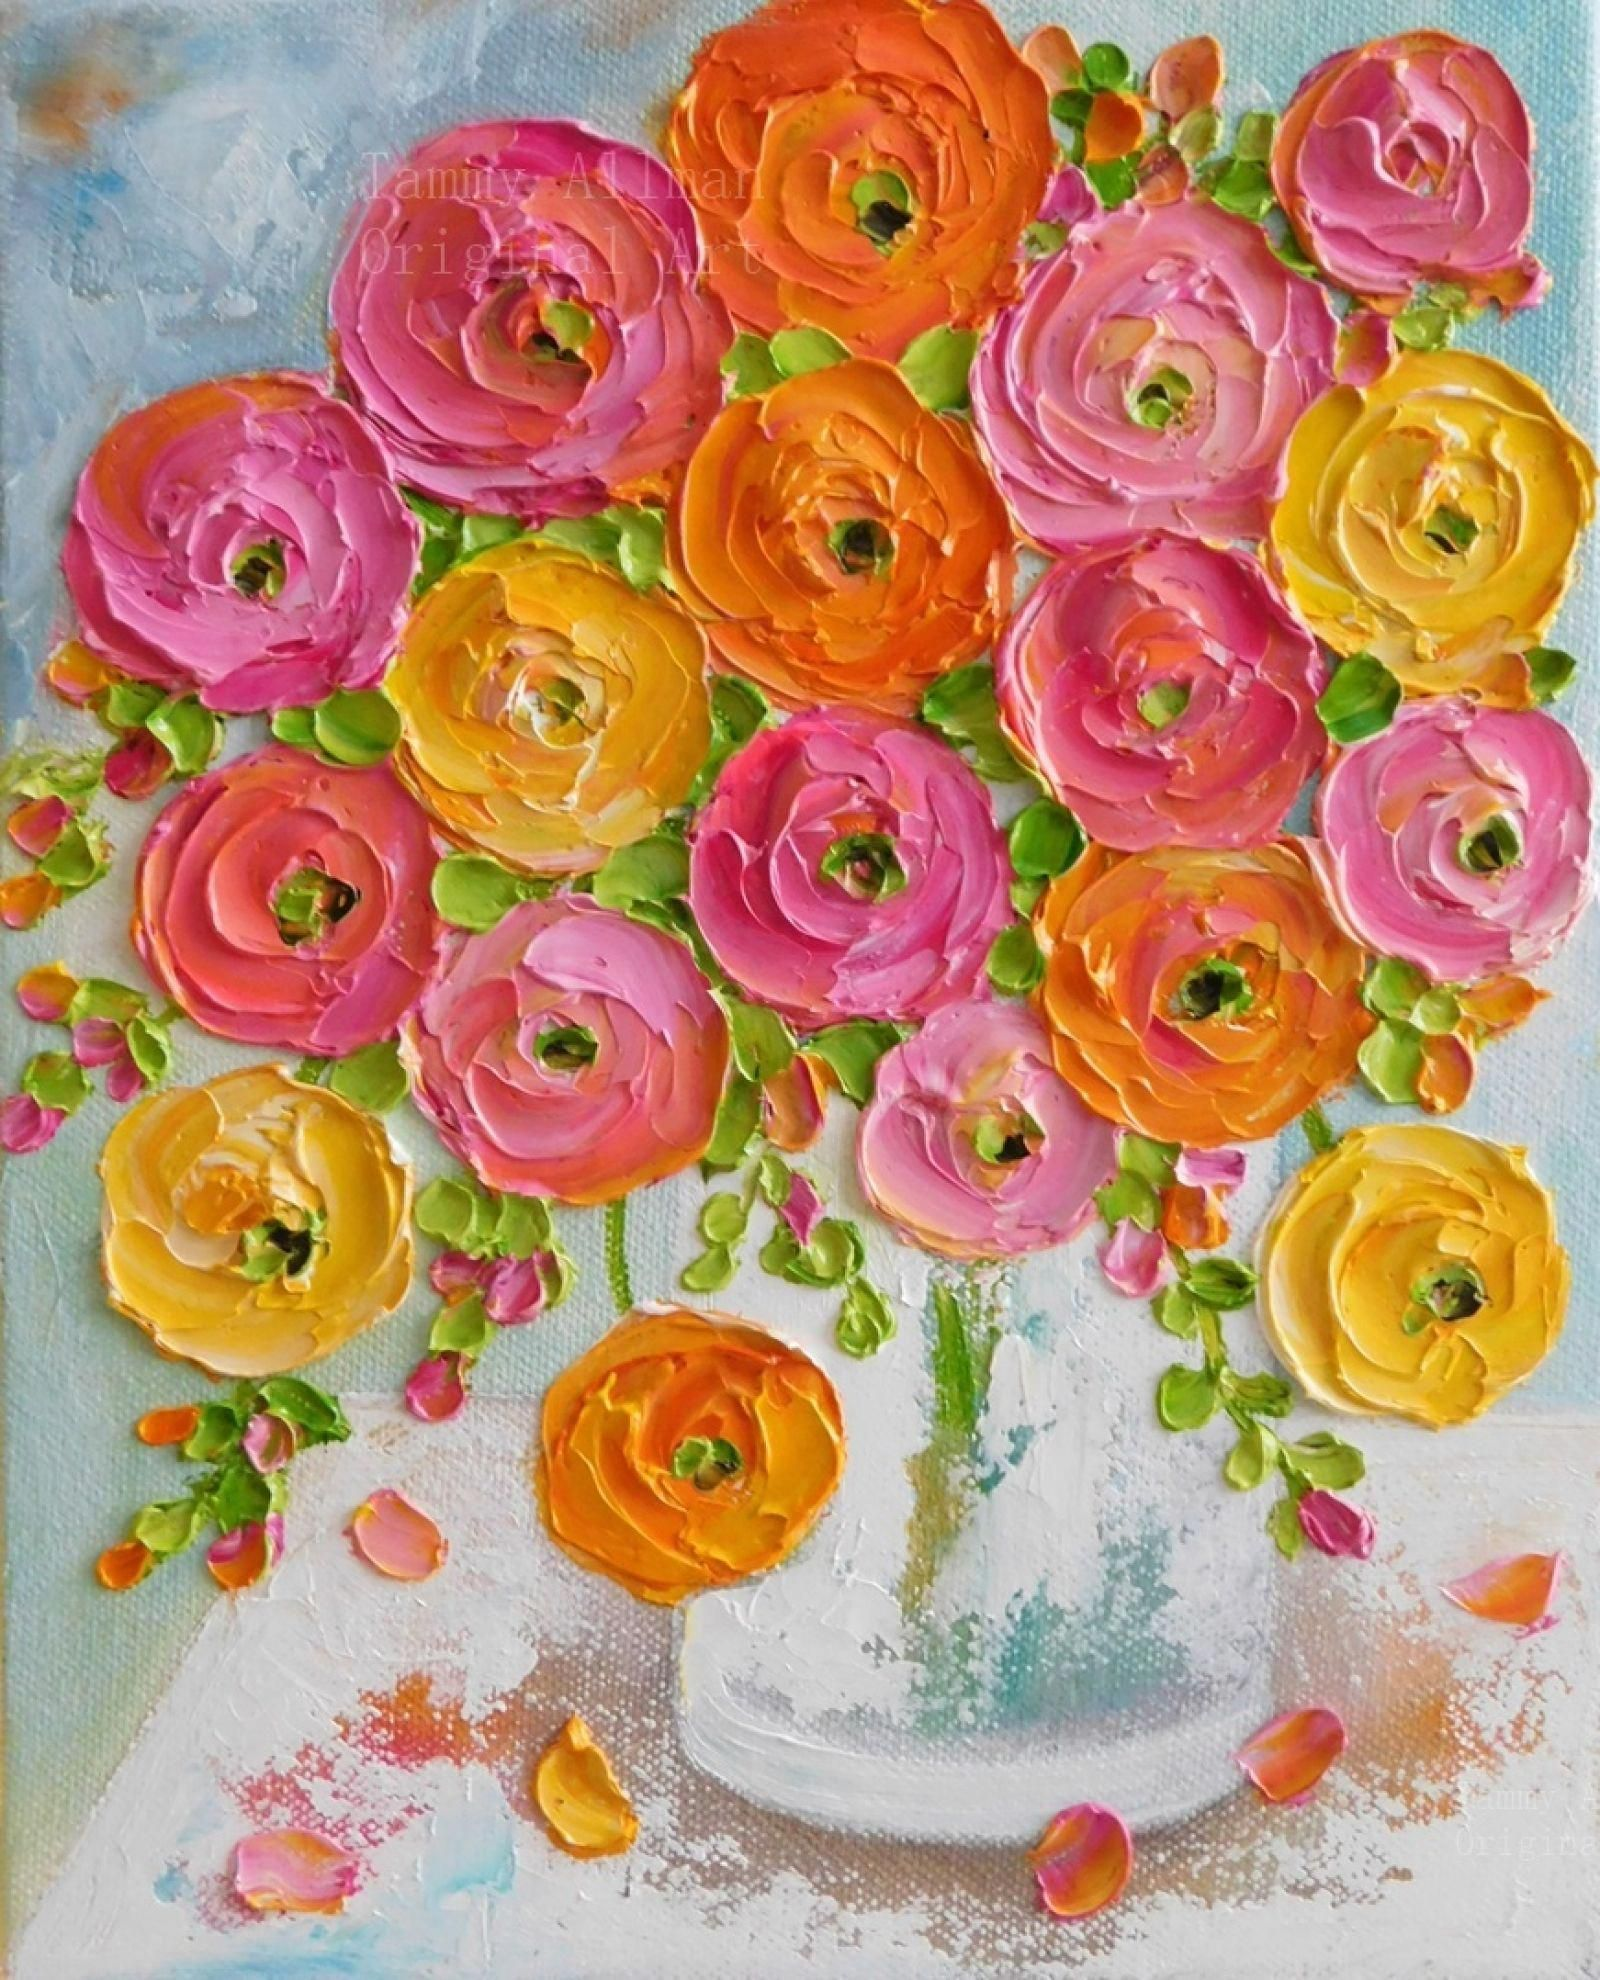 Mixed Ranunculus Custom Oil Painting Oil Impasto Ranunculus Painting Custom Oil Painting Floral Painting Ranunculus Painting